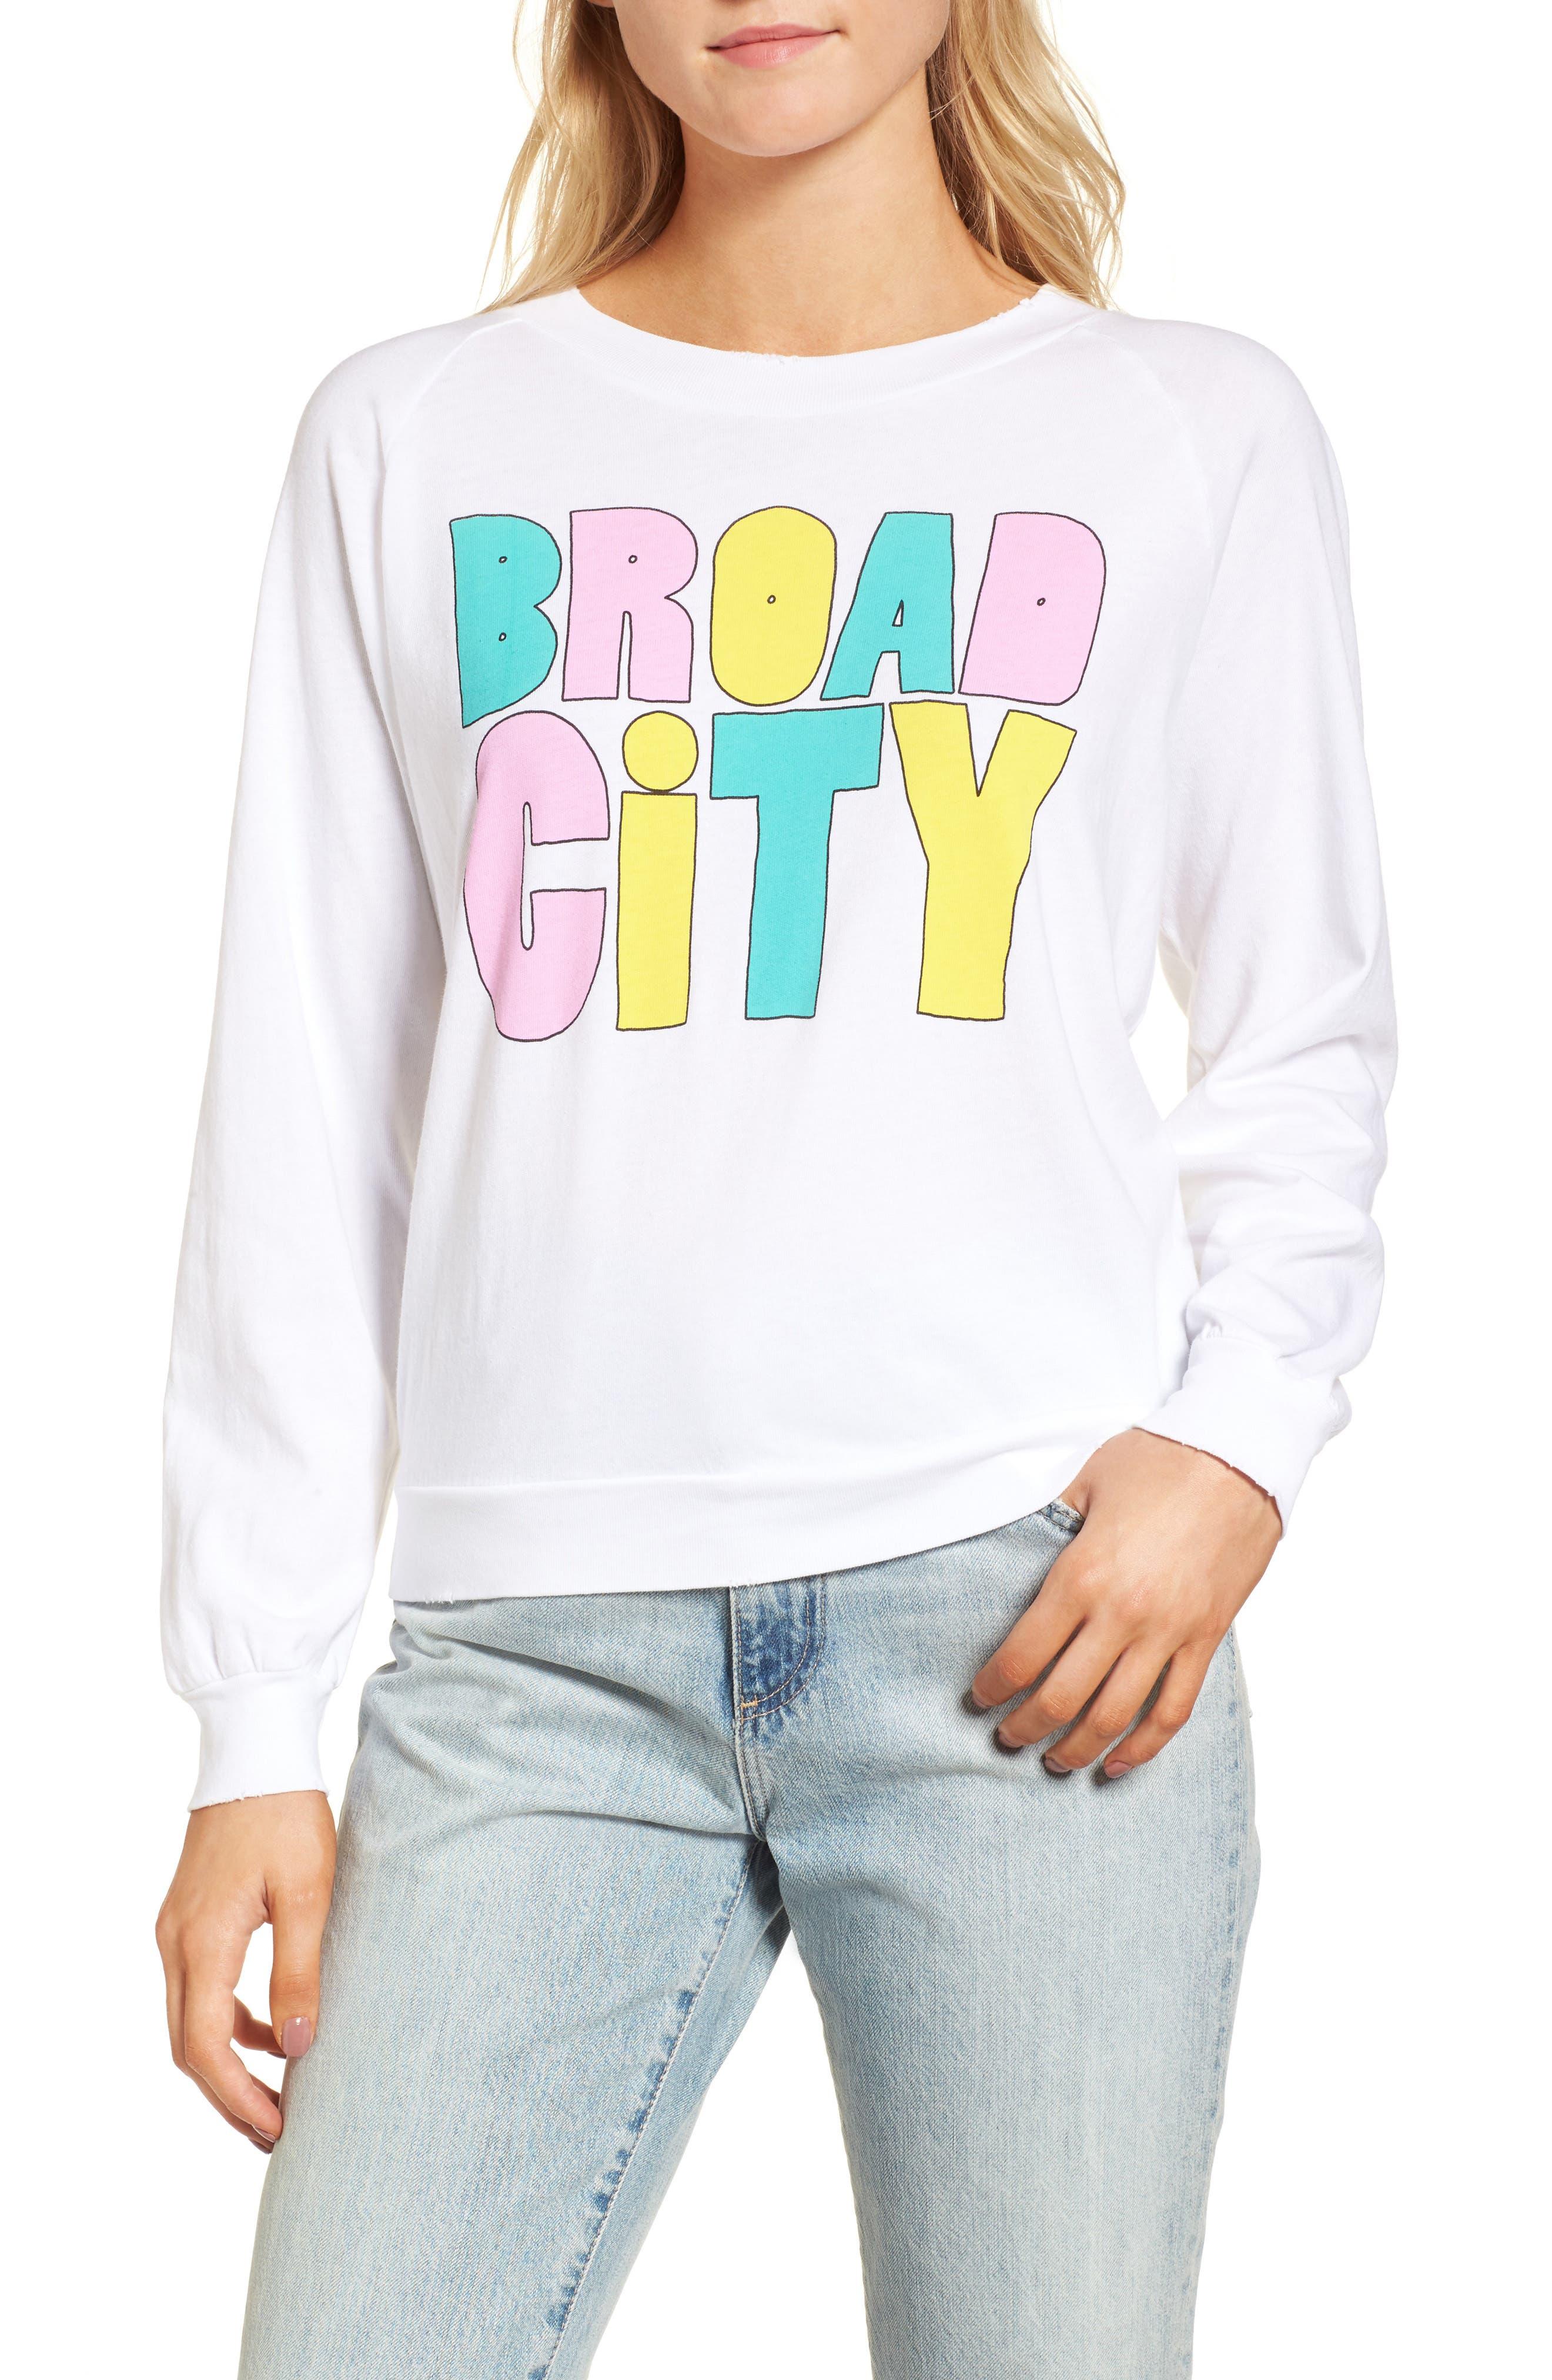 Broad City Cotton Graphic Sweatshirt,                         Main,                         color, 100